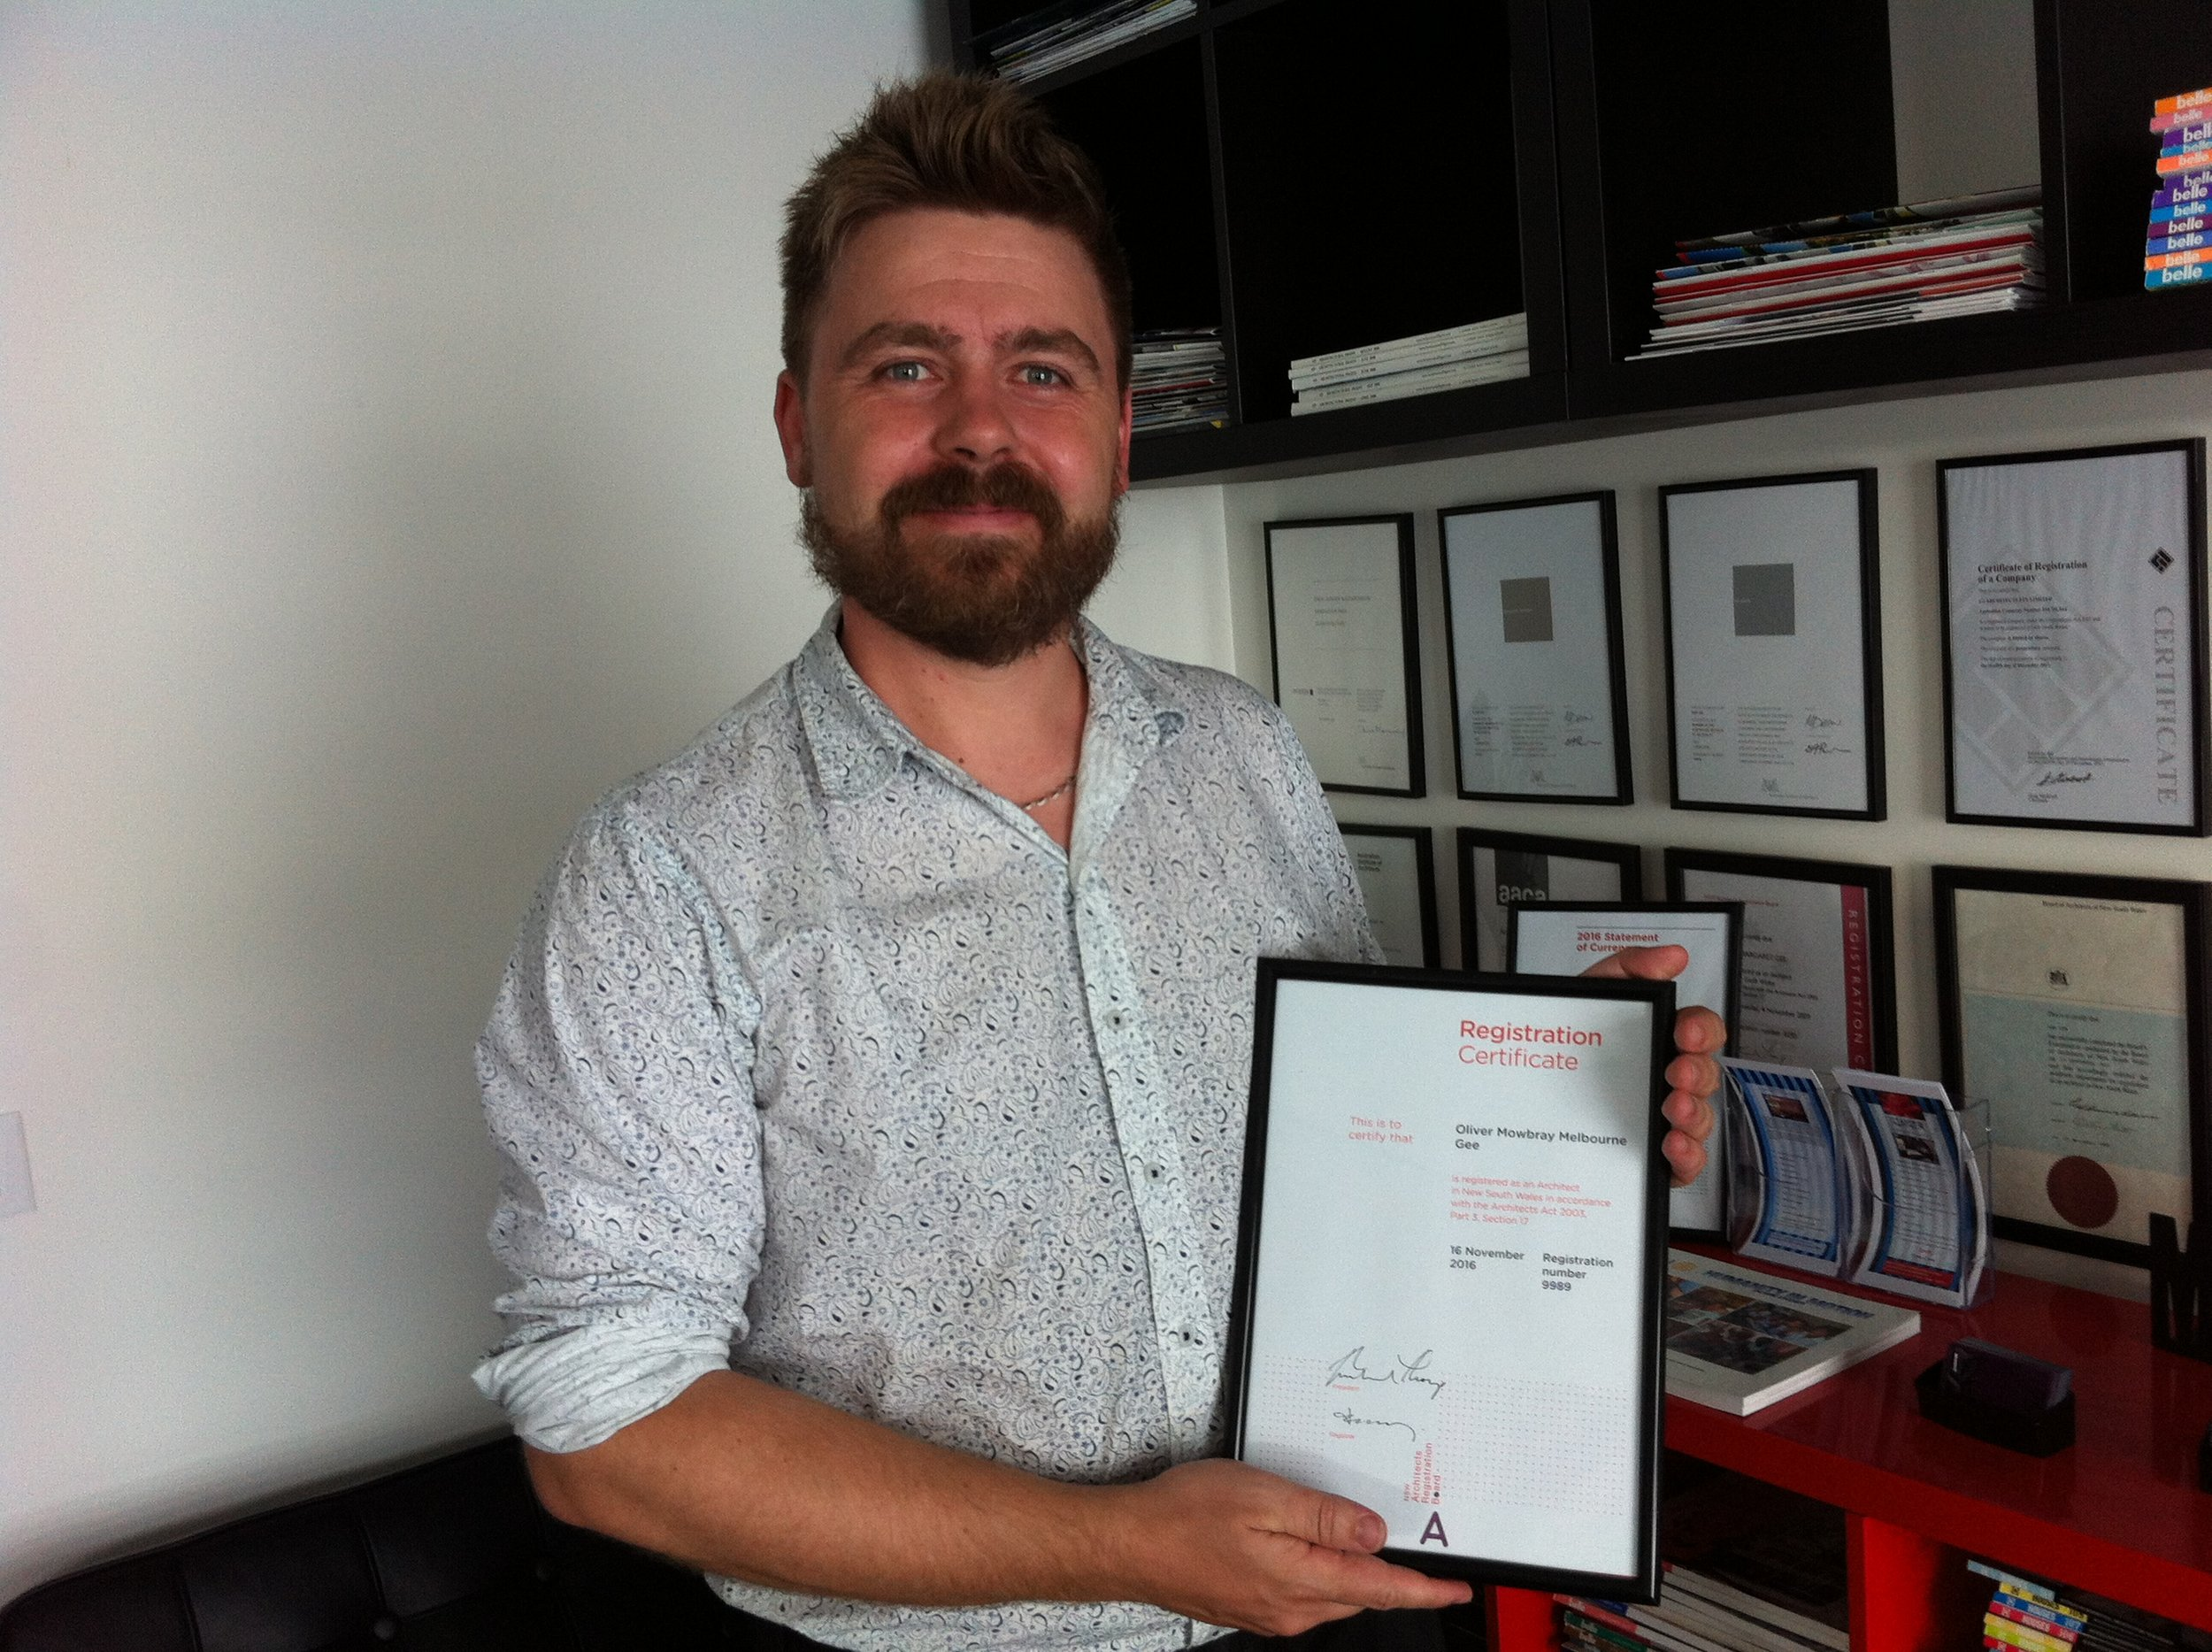 Oliver Gee- Registered Architect 16 November 2016